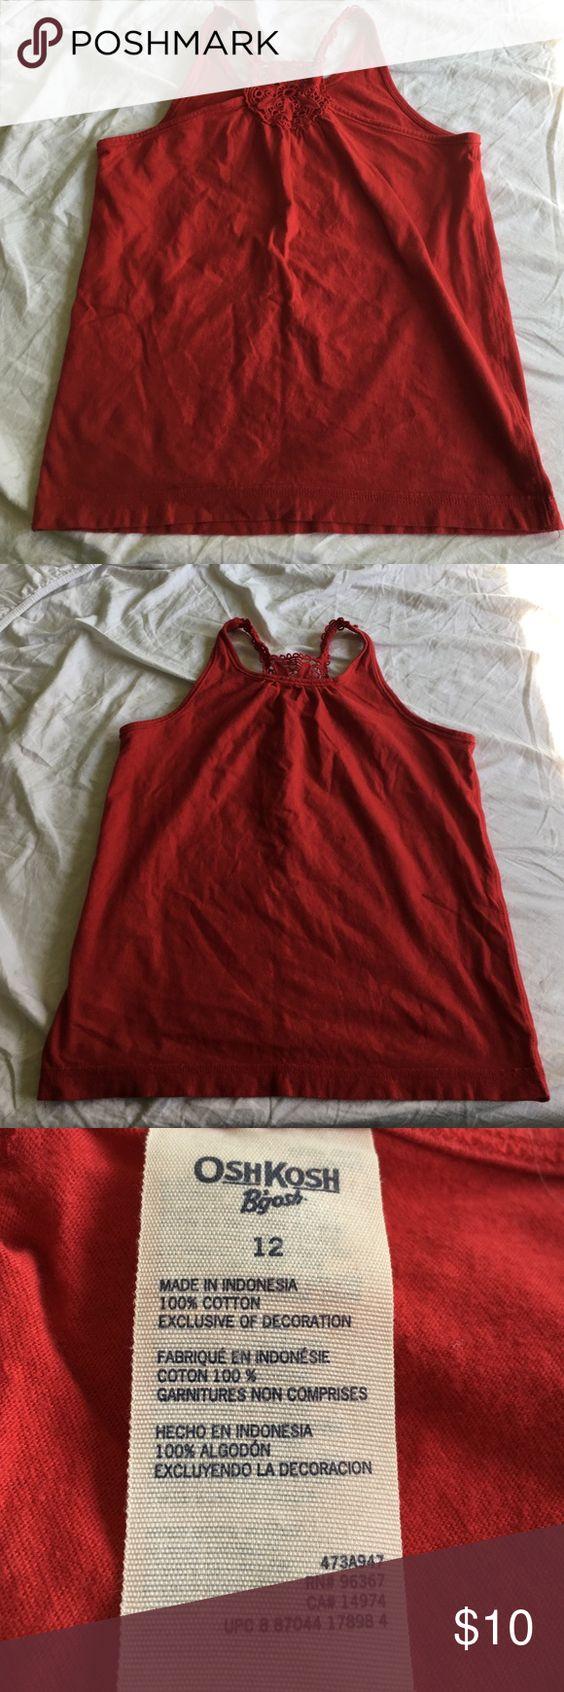 Red tank top Red tank top wit a beautiful back Osh Kosh Shirts & Tops Tank Tops